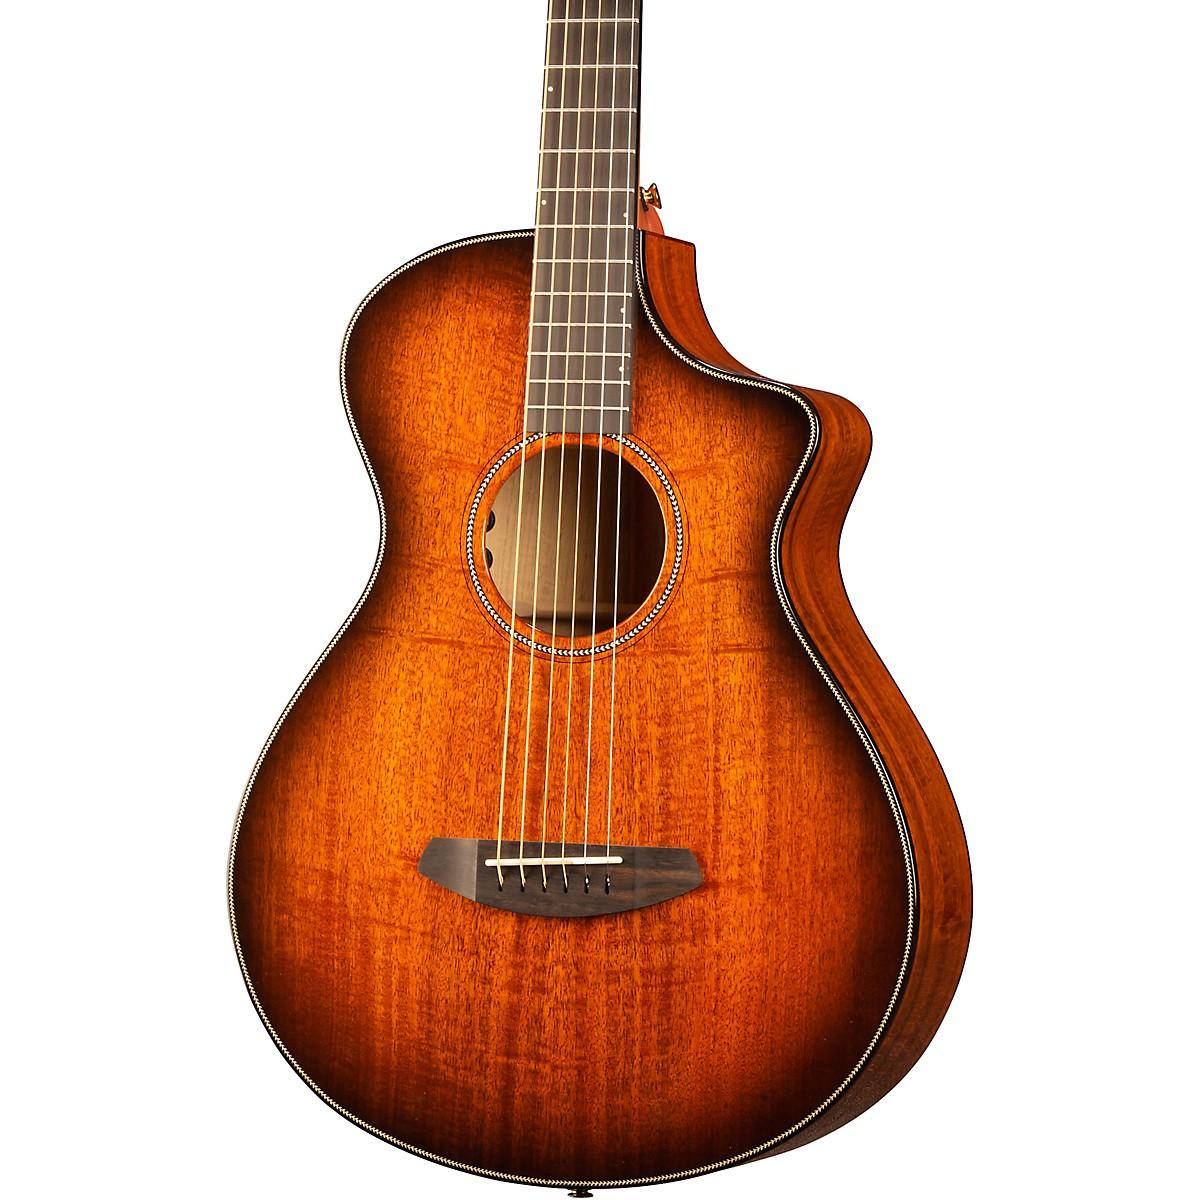 Breedlove Oregon Concertina CE Myrtlewood Acoustic-Electric Guitar